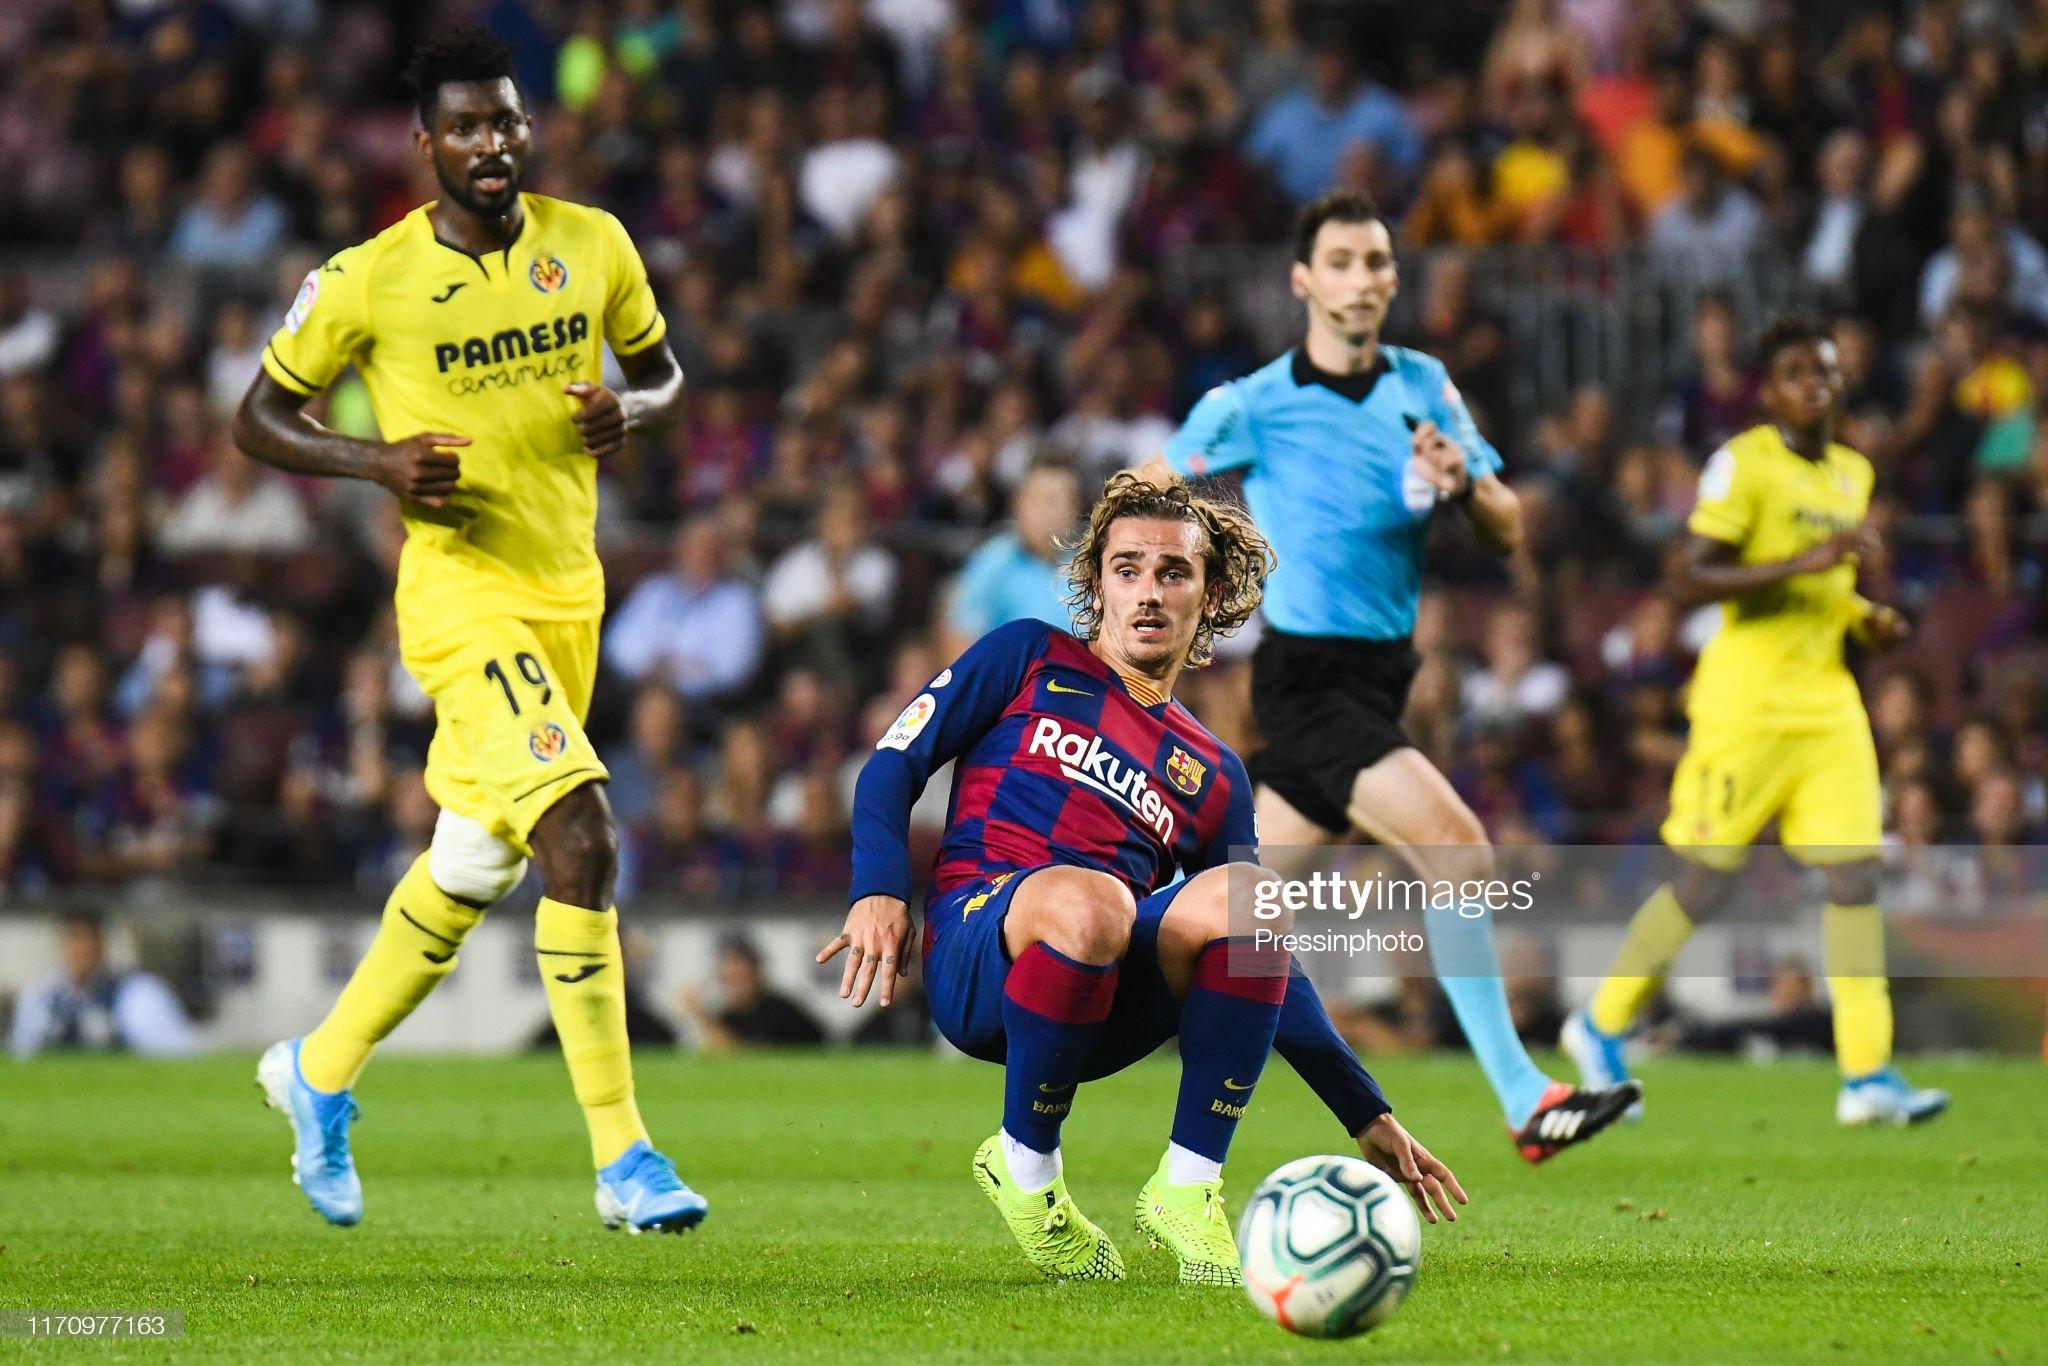 صور مباراة : برشلونة - فياريال 2-1 ( 24-09-2019 )  Antoine-griezmann-of-fc-barcelona-during-the-liga-match-between-and-picture-id1170977163?s=2048x2048